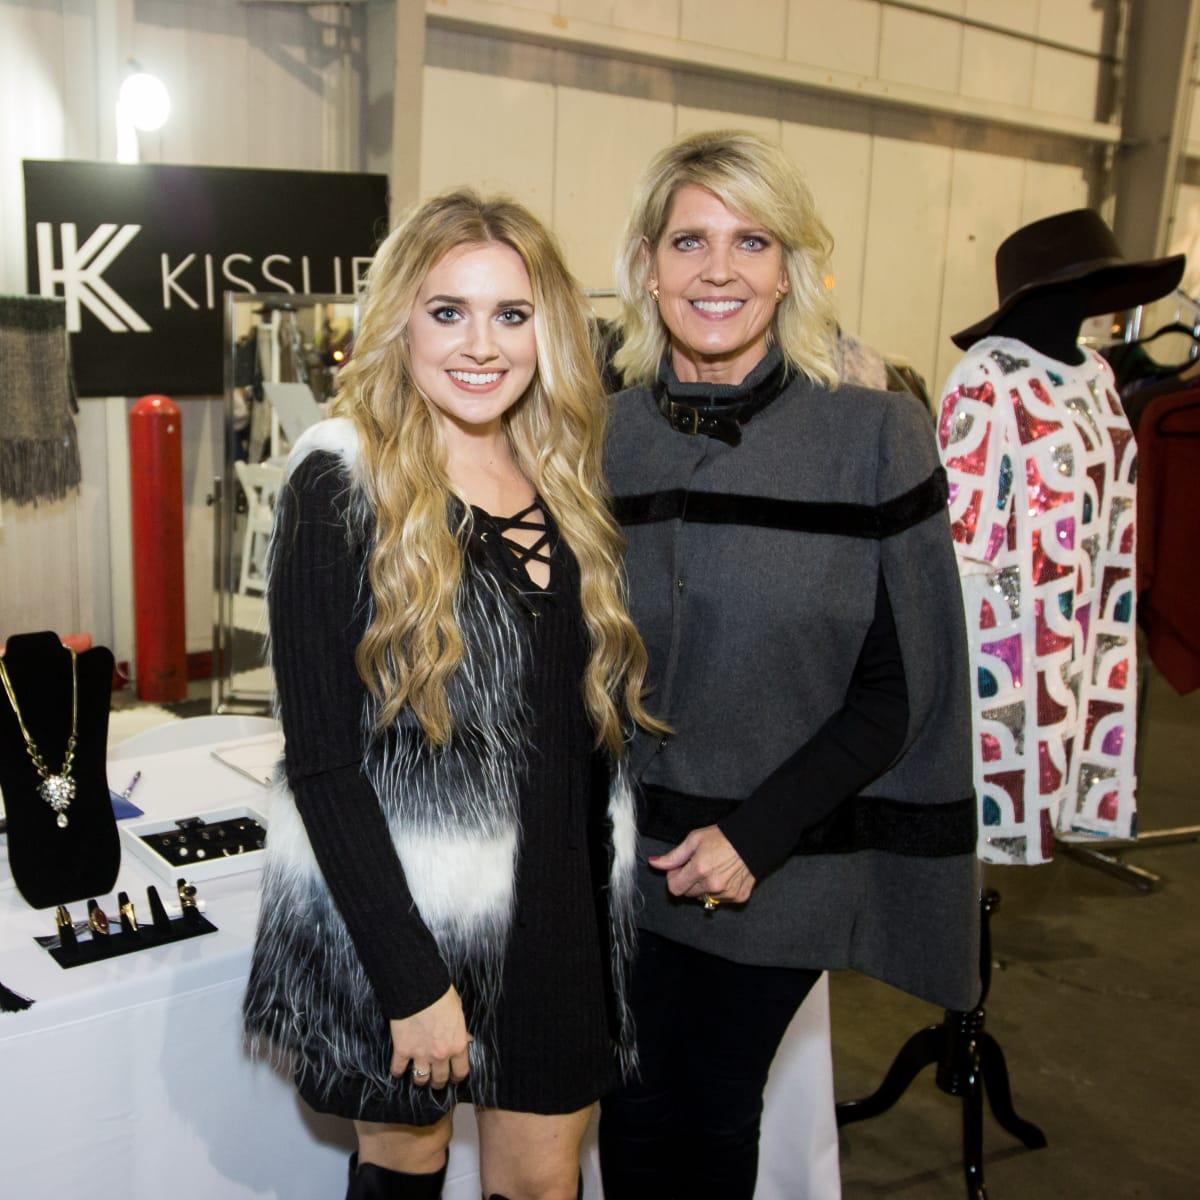 News, CM Holiday Pop-Up Shop , Dec. 2015, Kailey McCollum (owner/co-founder), Bridget Tissue